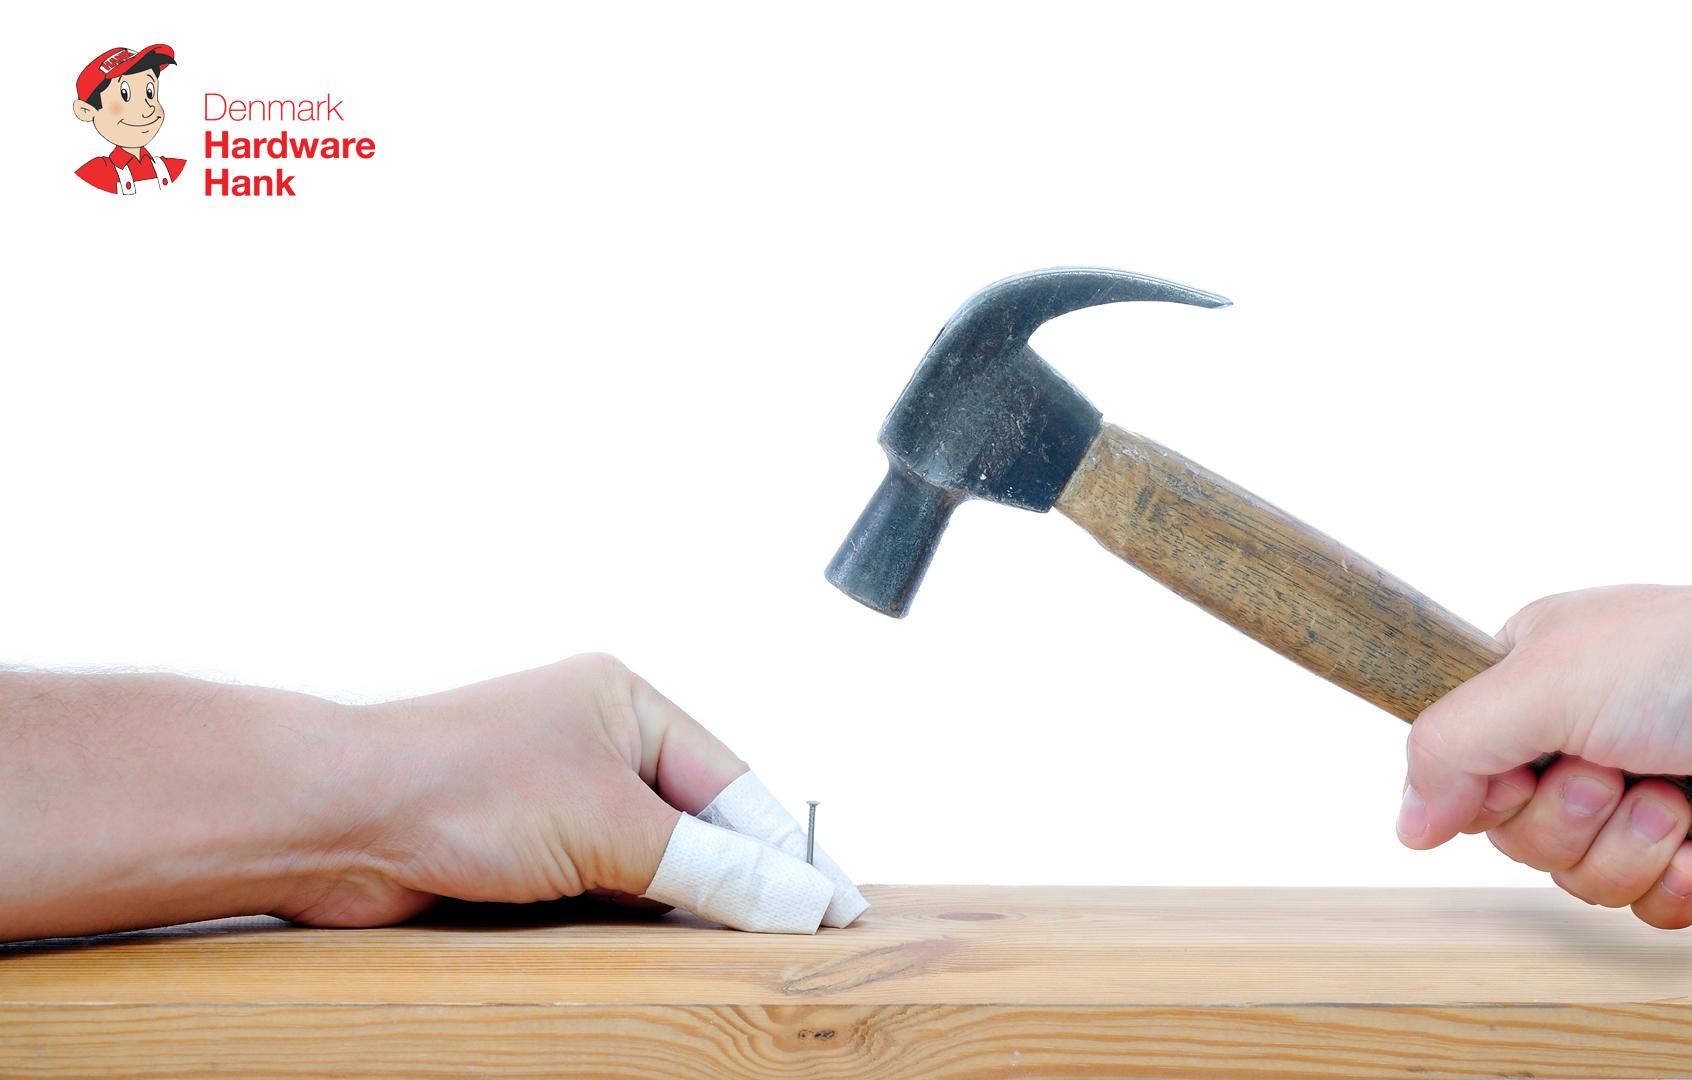 Denmark Hardware Hank Hammer and nail